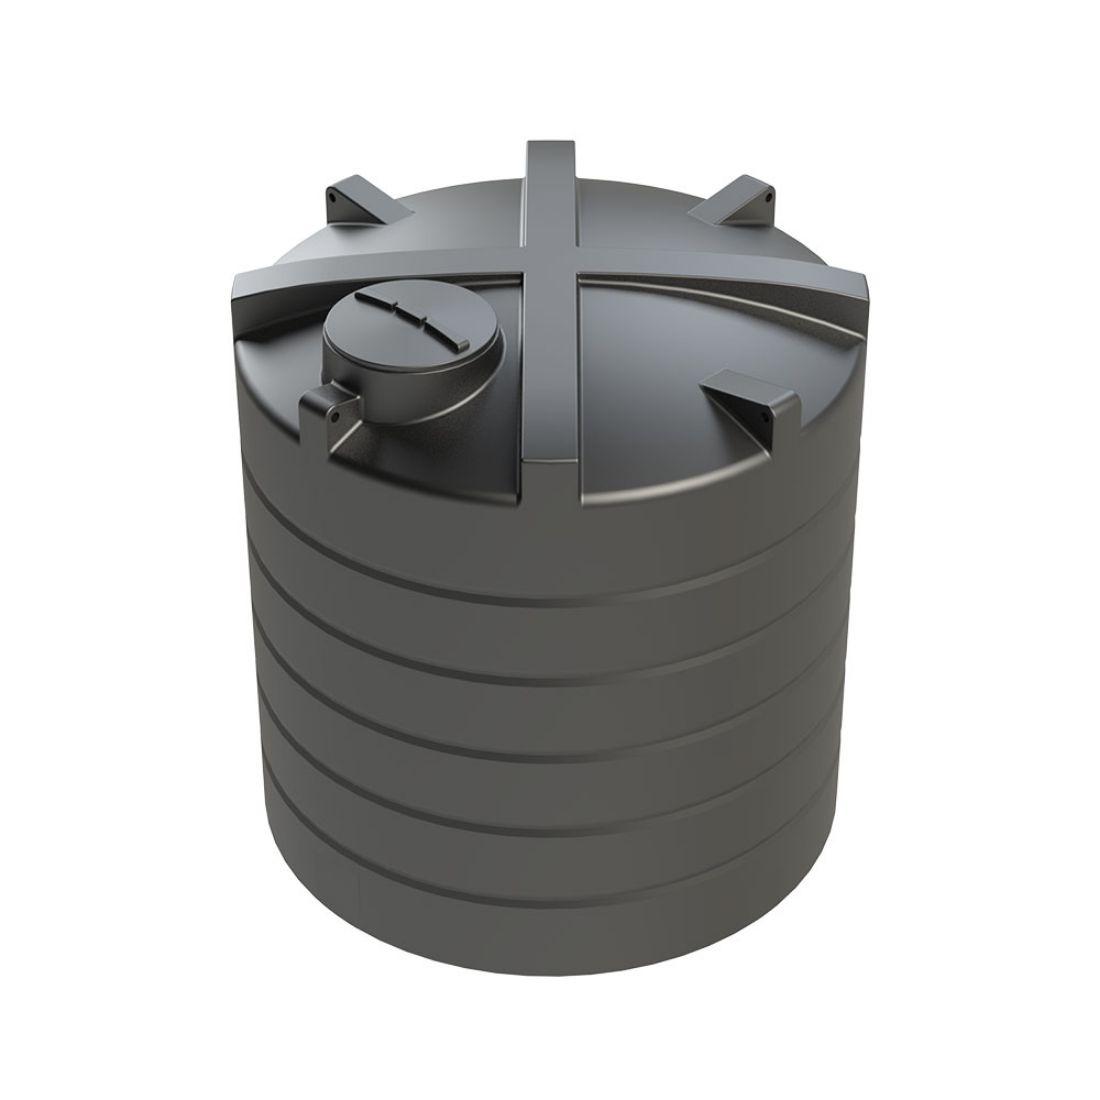 Enduramaxx 10,000 Litre Vertical Non-Potable Water Storage Tank